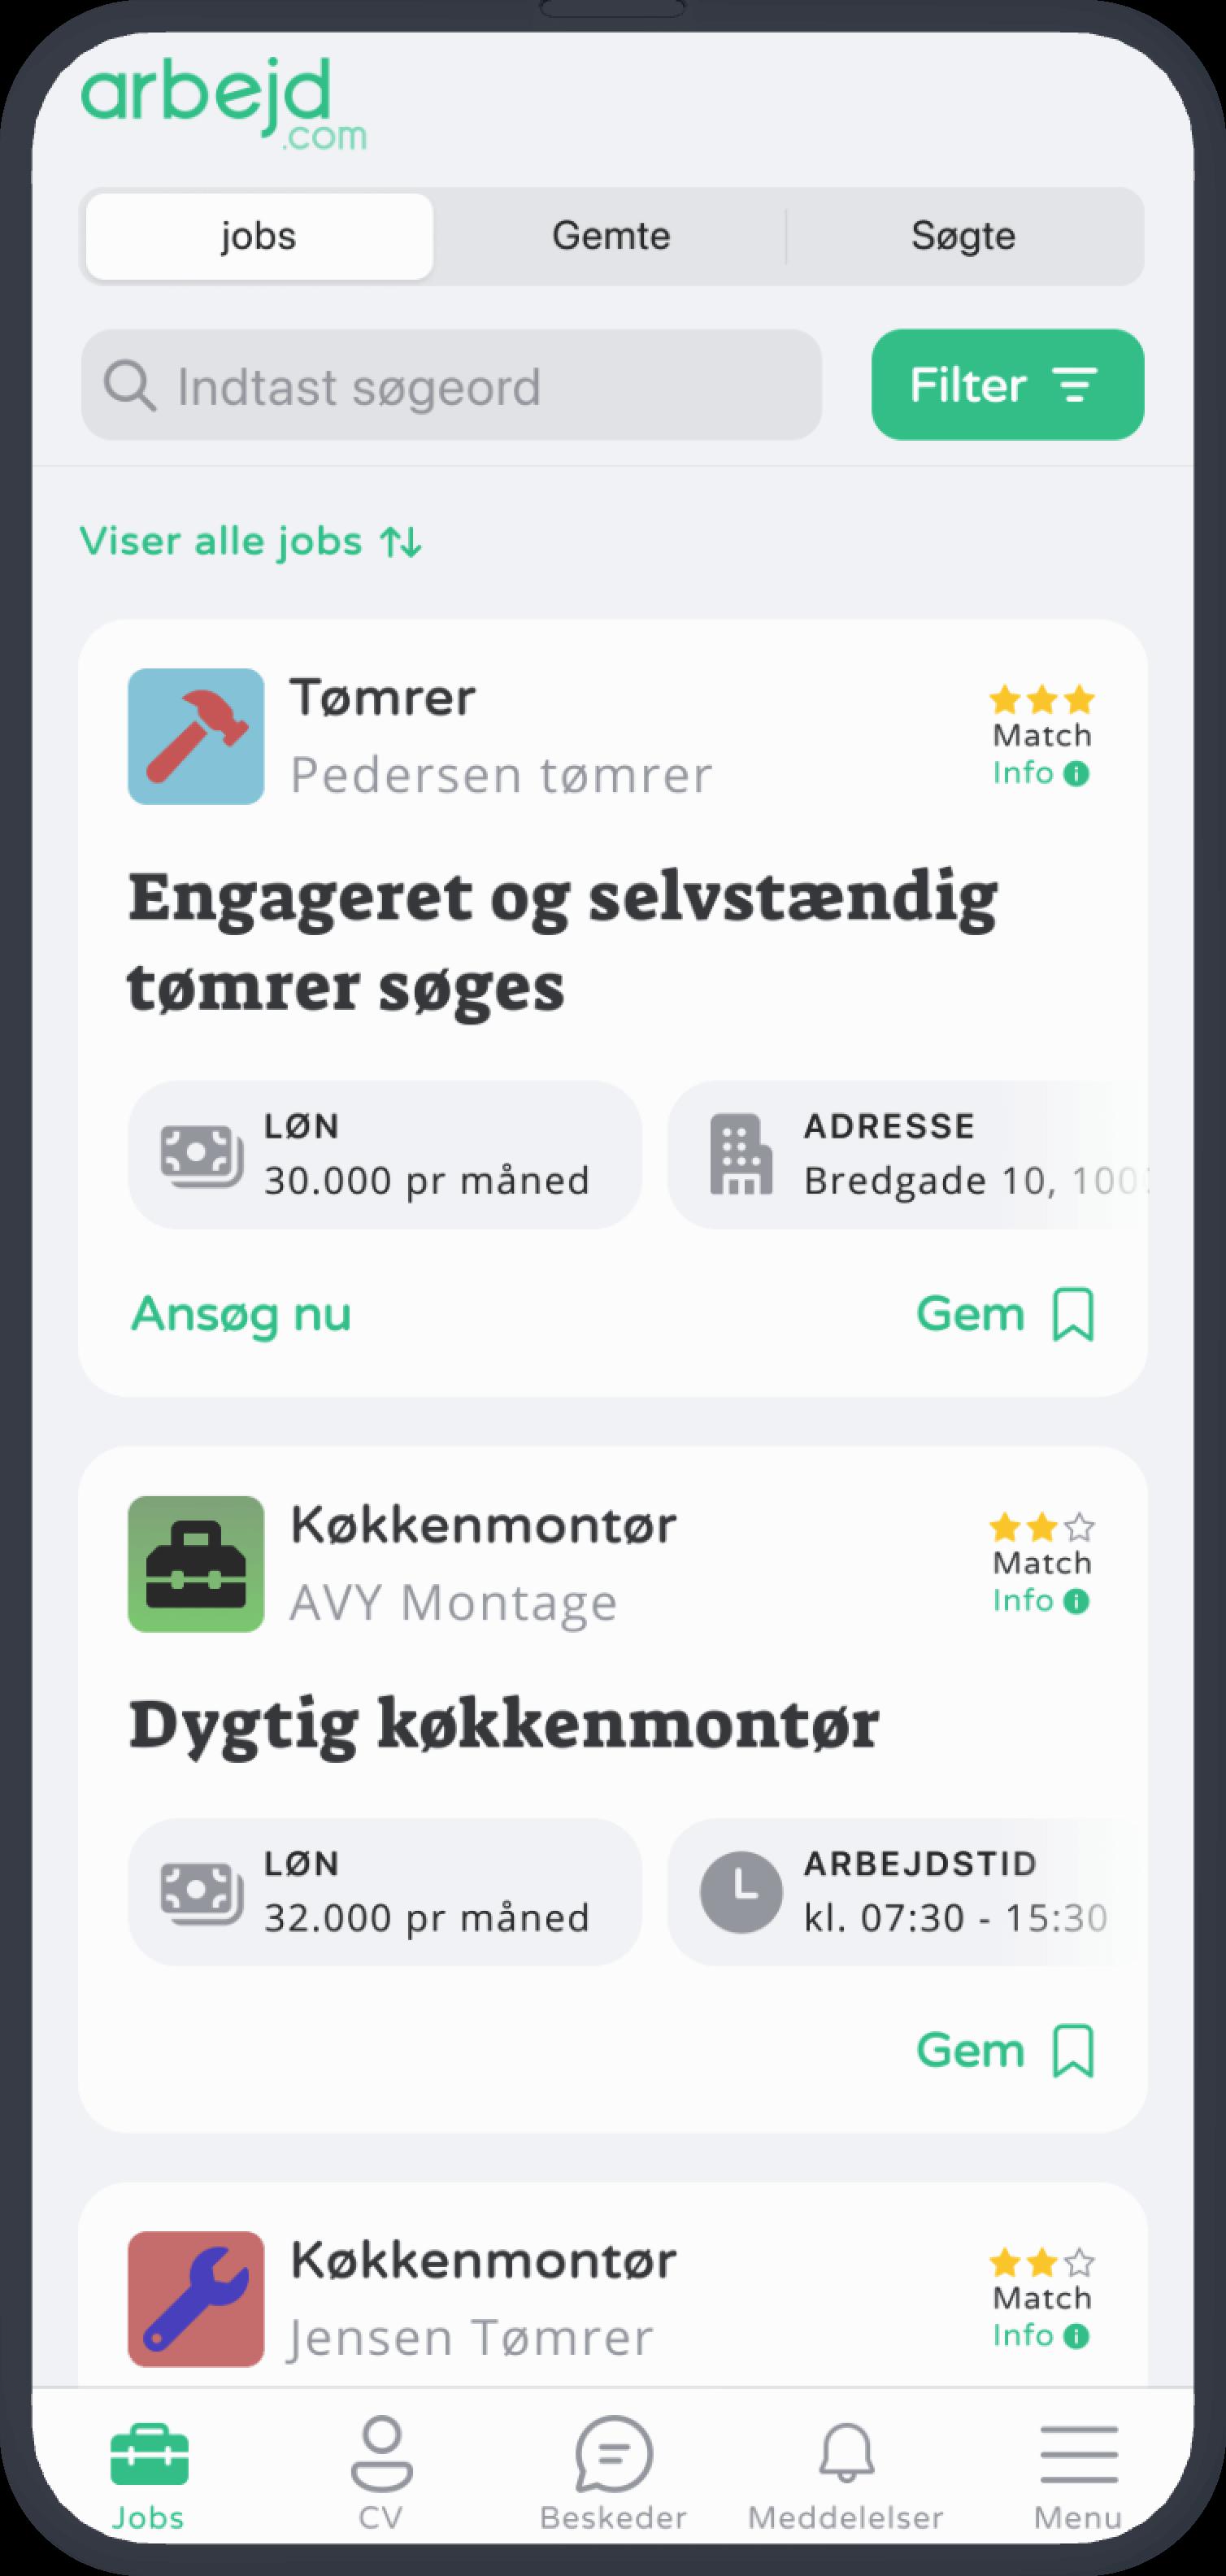 Arbejd.com app showing a list of jobs